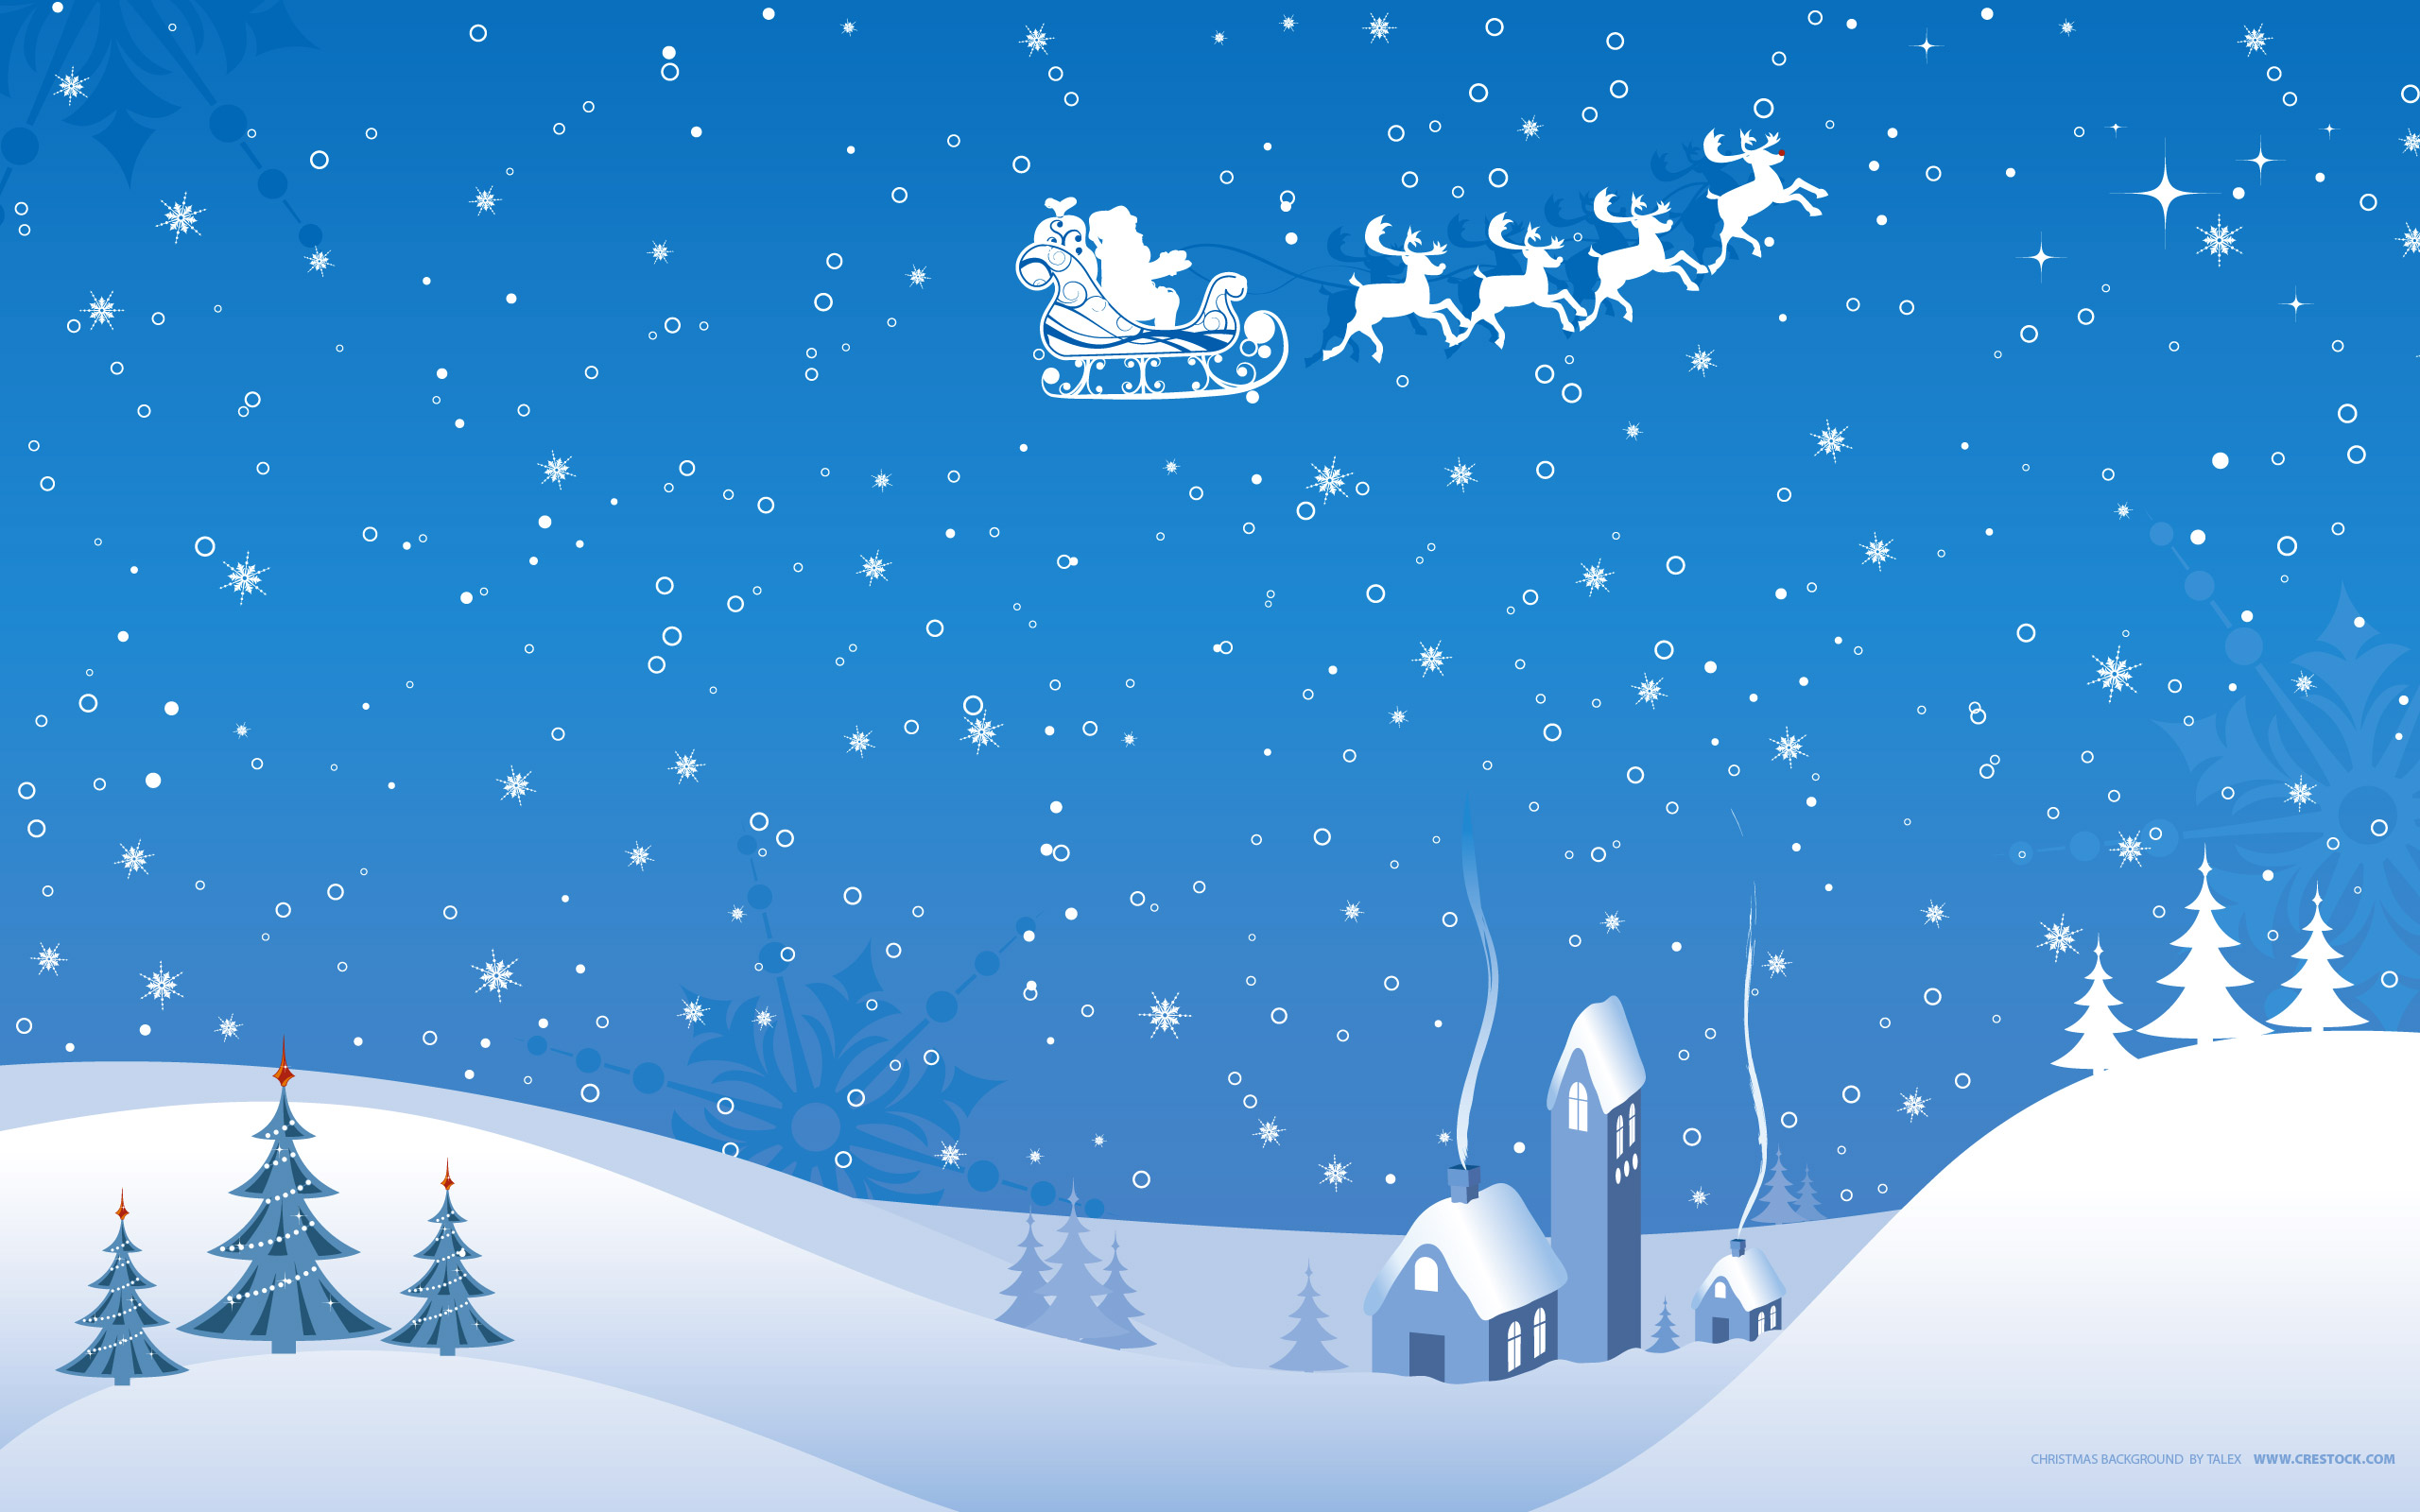 16 Stunning High Resolution Christmas Wallpapers Crestock